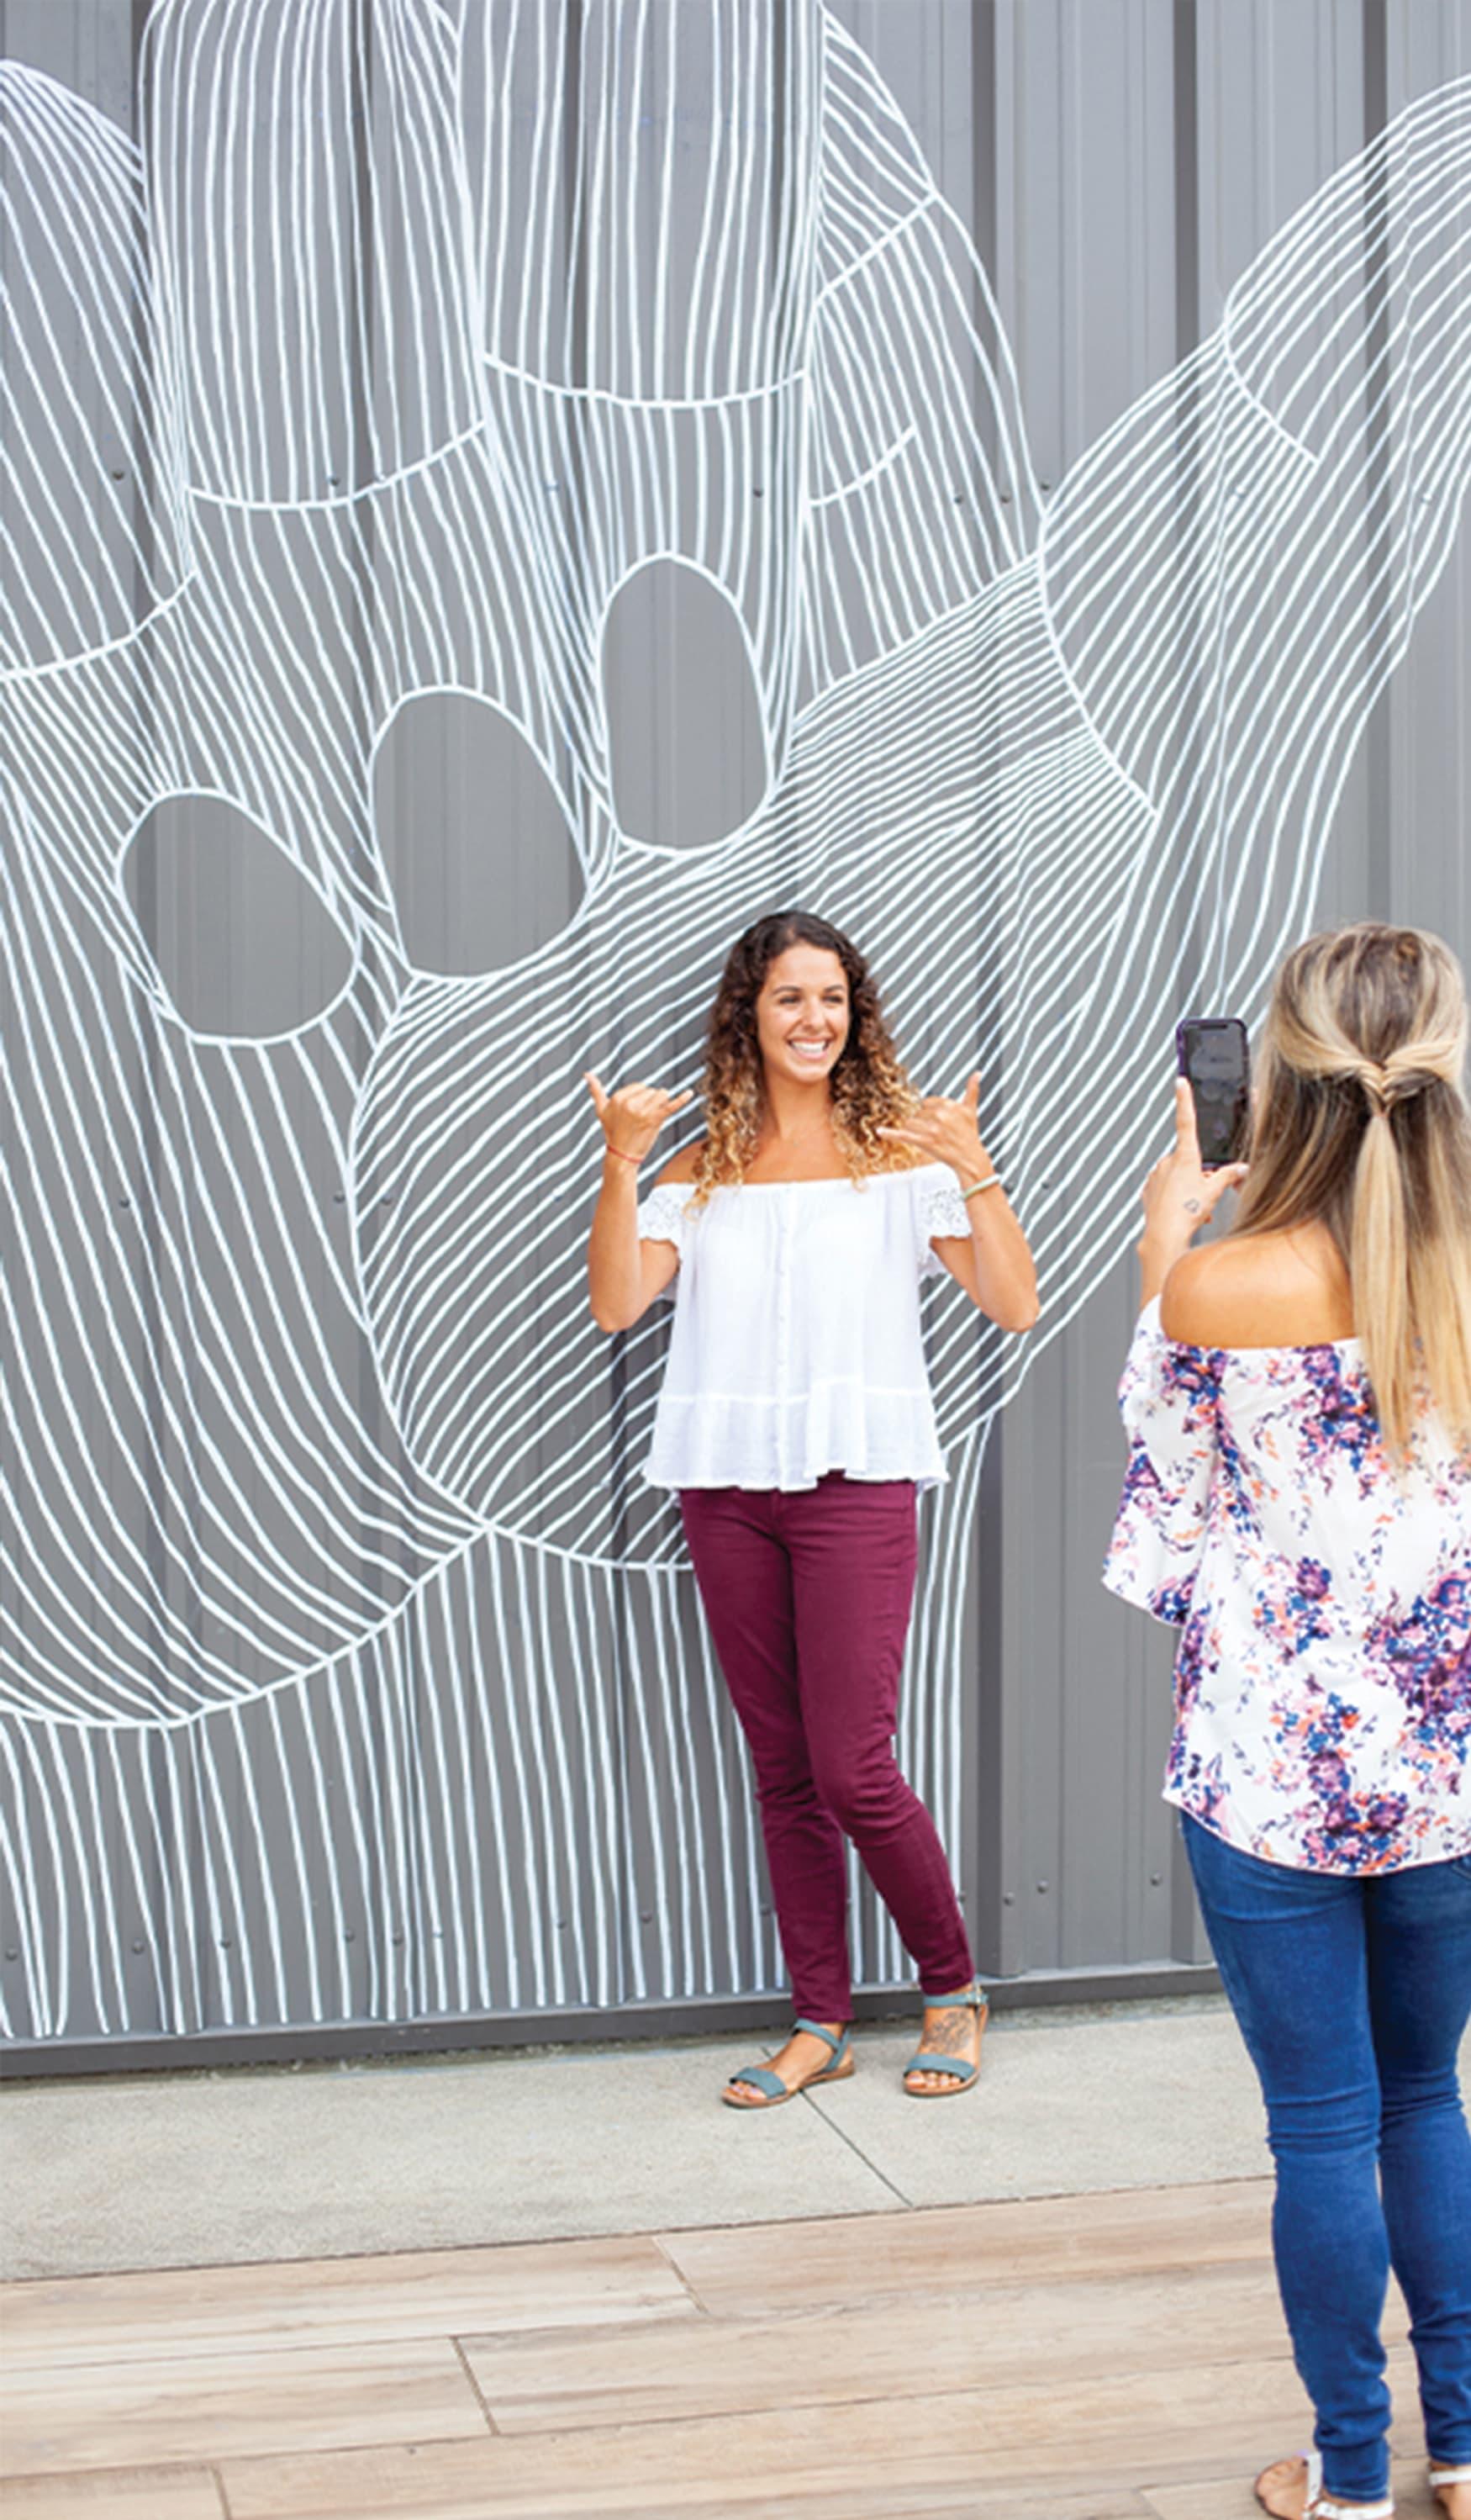 Long Beach Exchange Retail Design Project Interactive Mural Design and Street Art